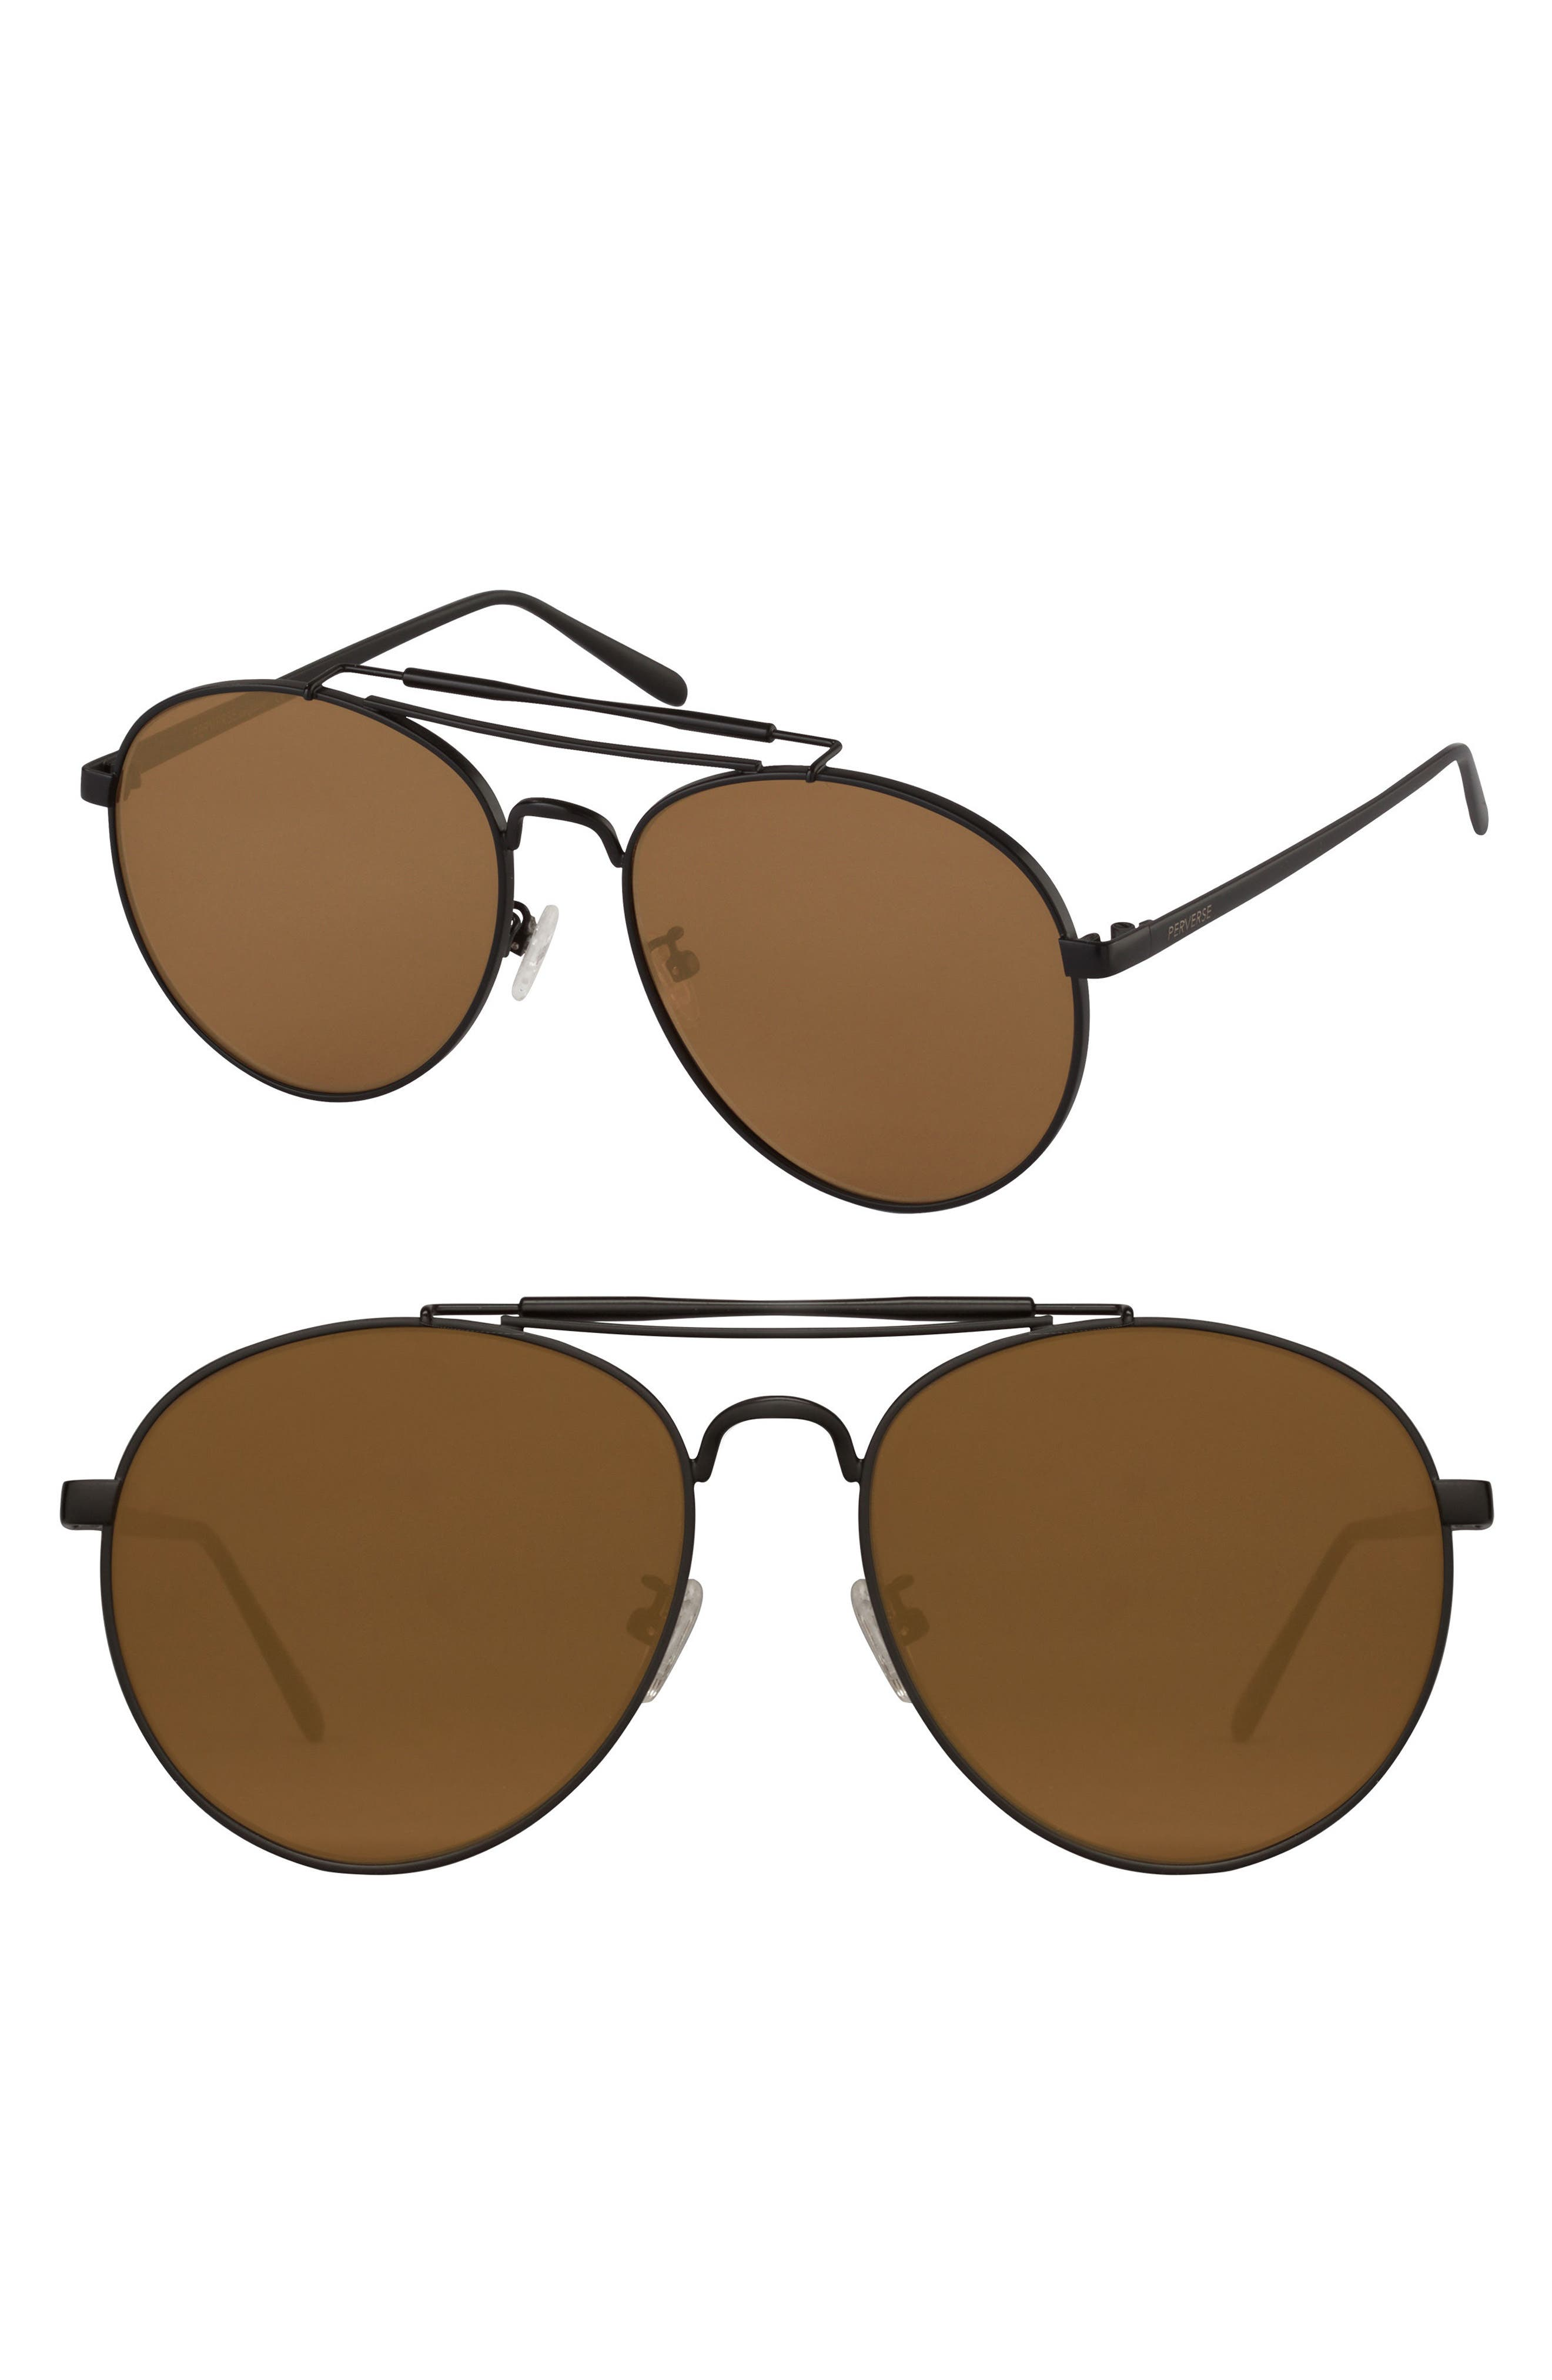 50mm Aviator Sunglasses,                         Main,                         color, 001